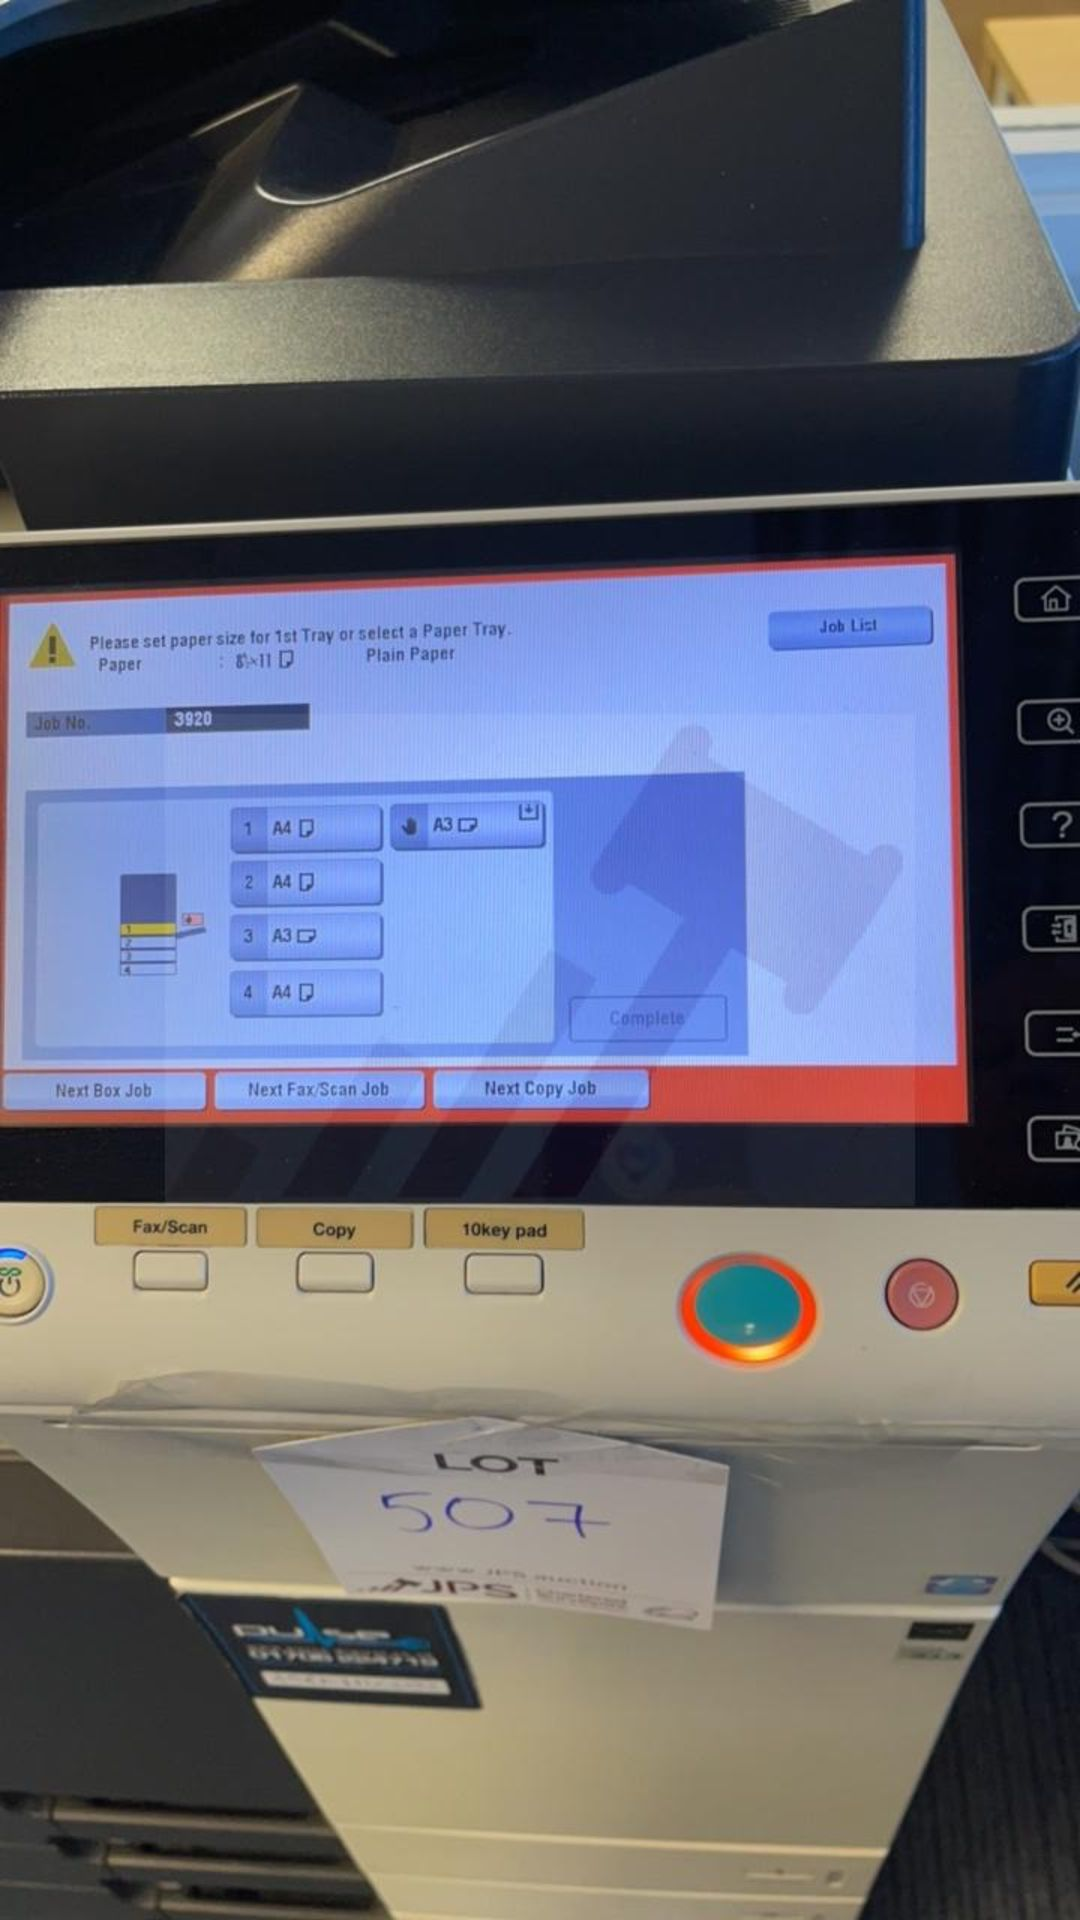 Konica Minolta Bizhub C364E A3 Multi-Functional Printer - Image 4 of 6